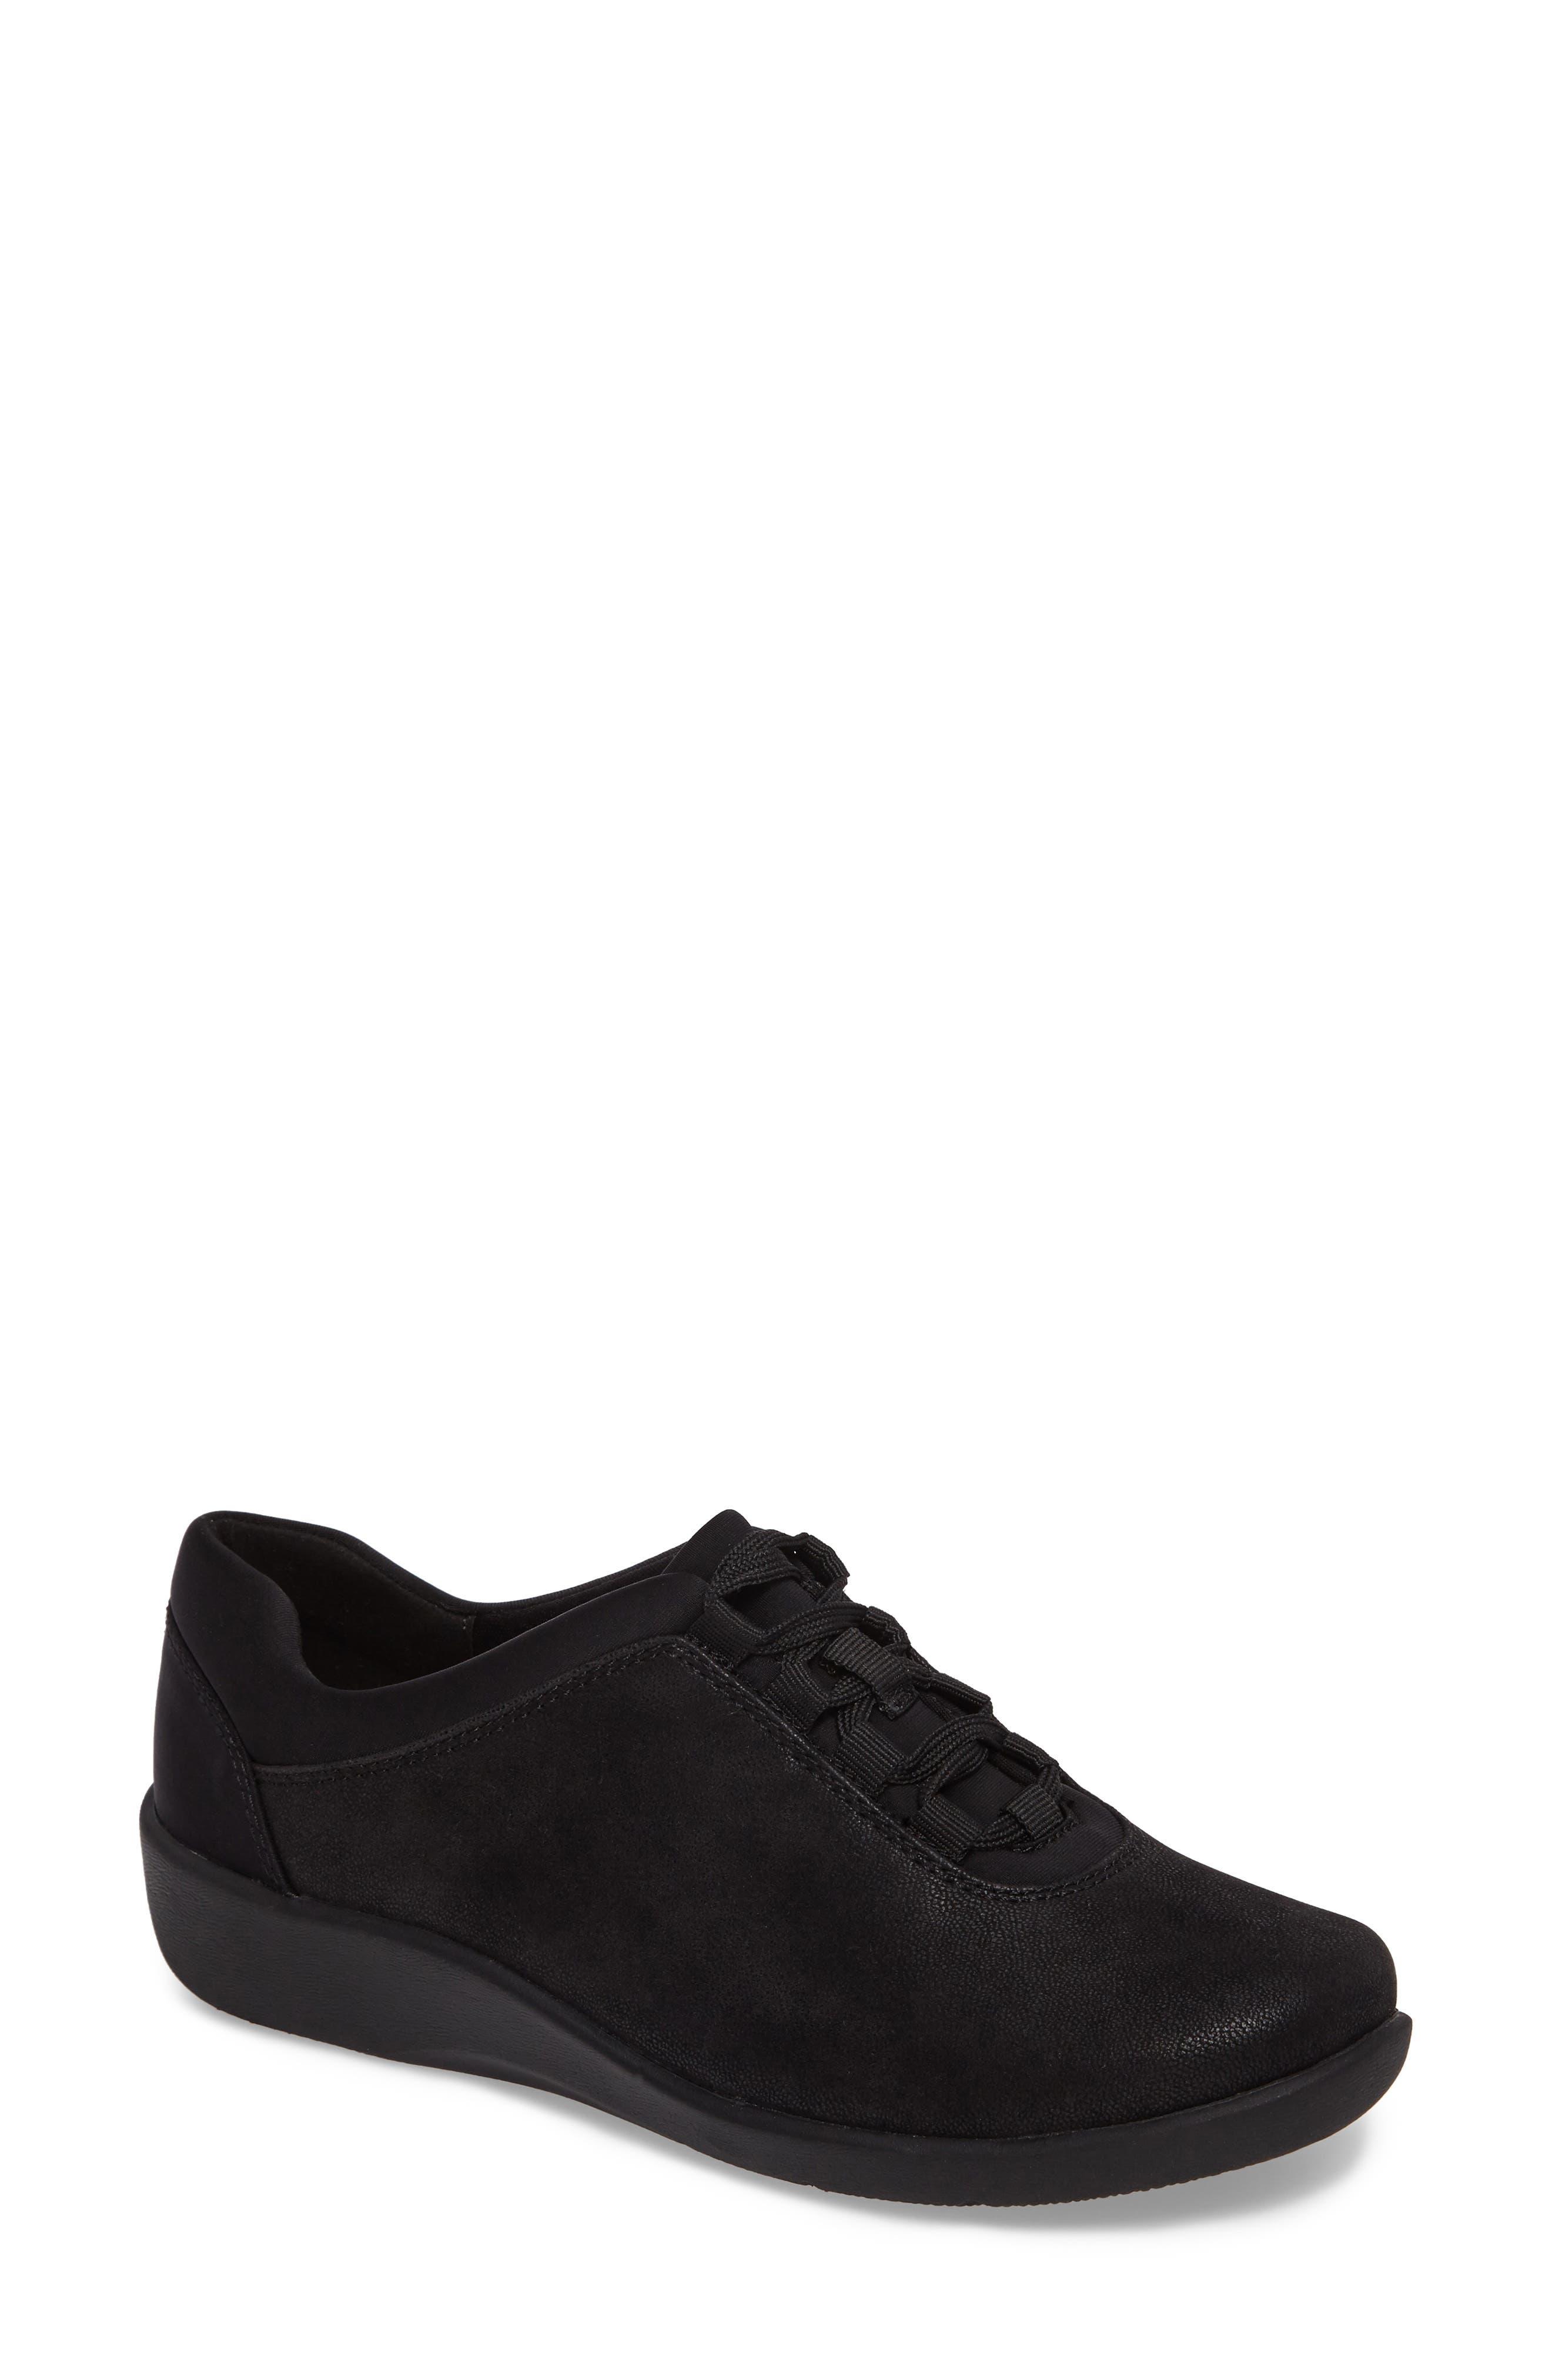 Alternate Image 1 Selected - Clarks® Sillian Pine Sneaker (Women)